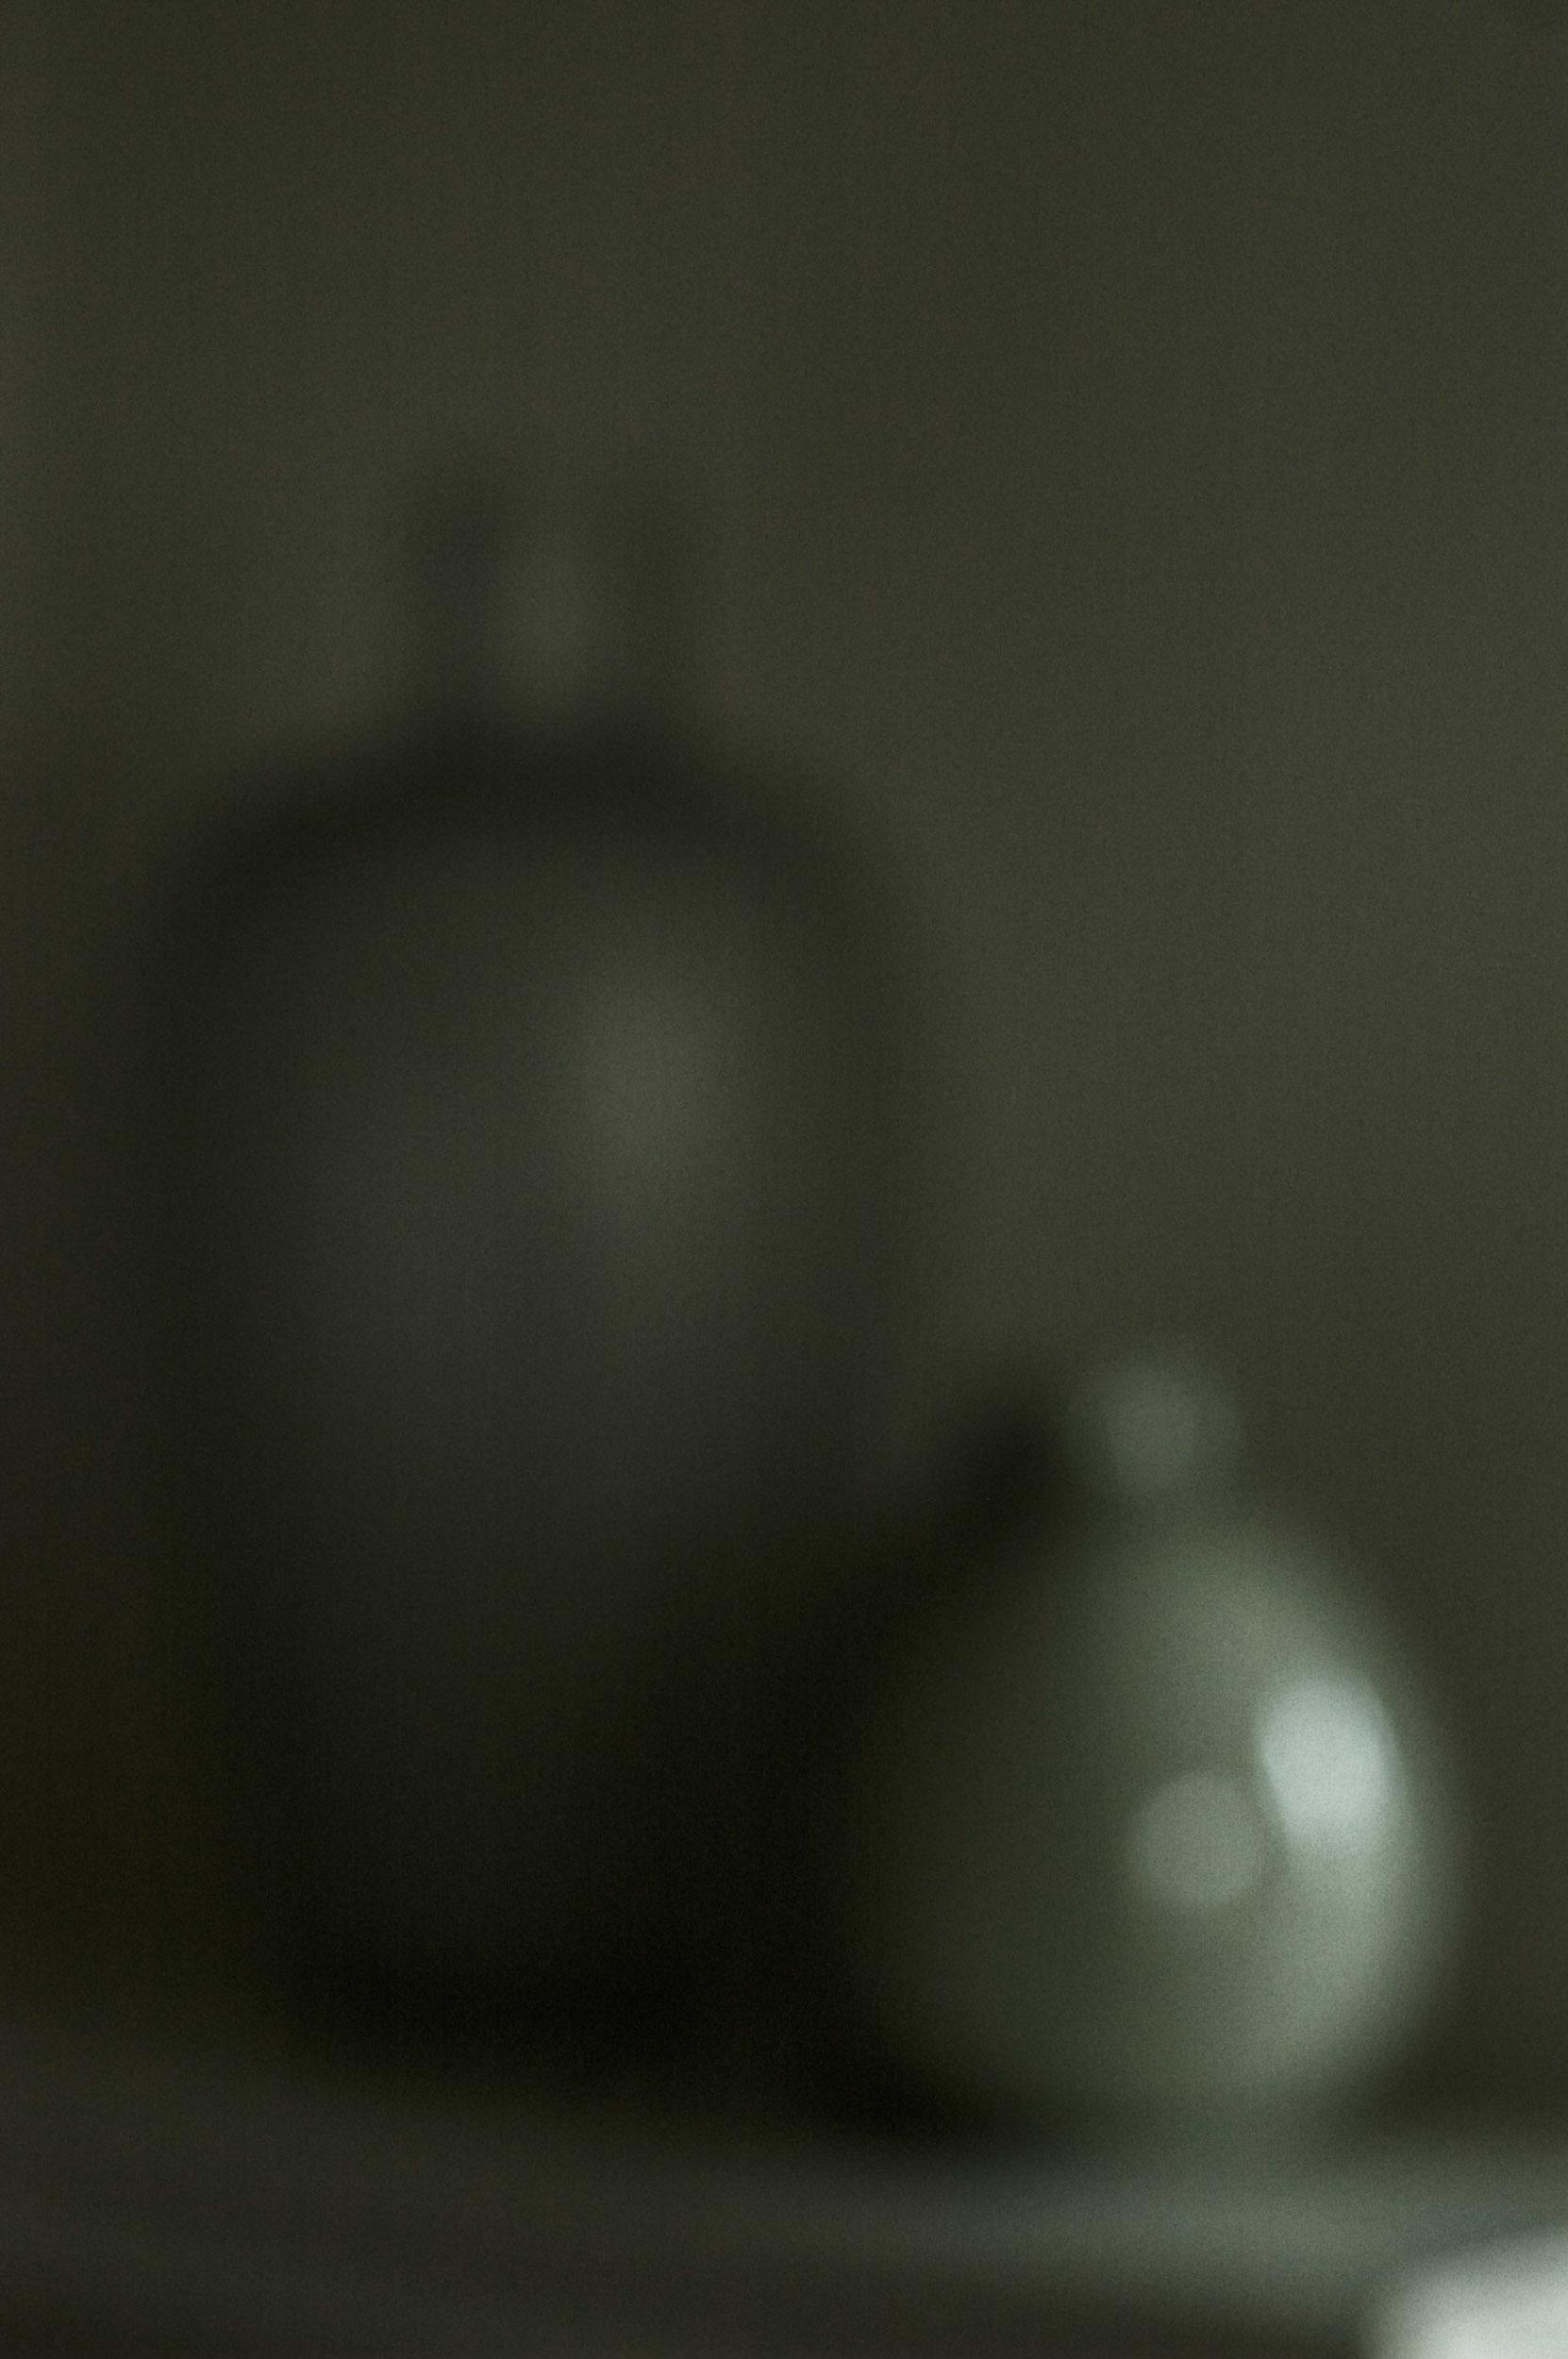 seeking light-198200.jpg